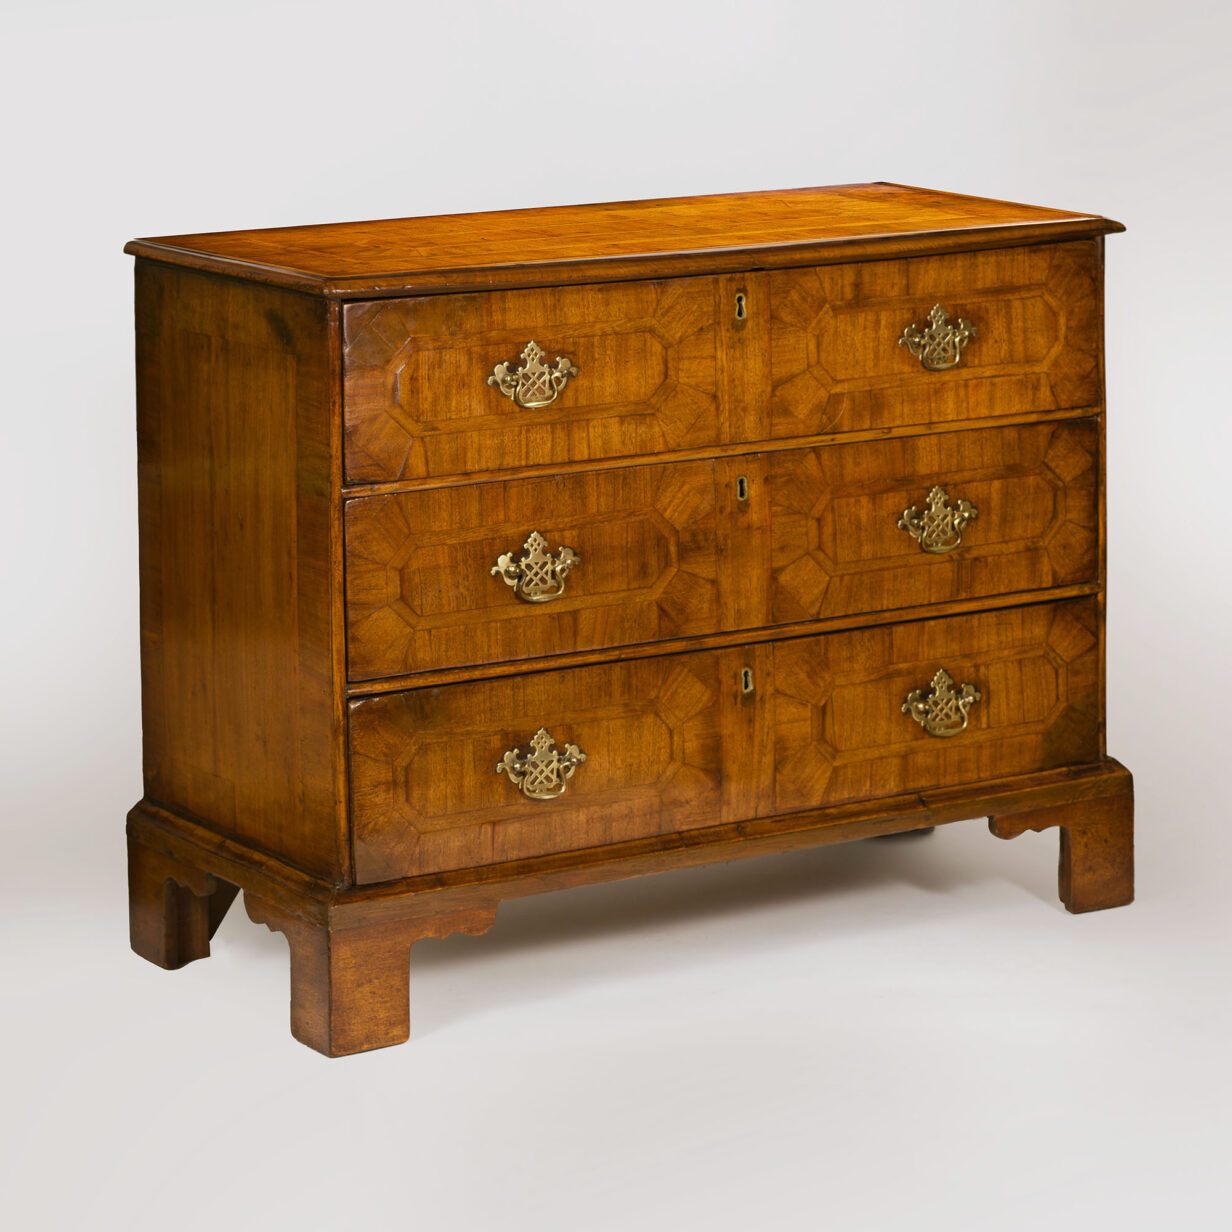 George II Walnut Chest of Drawers